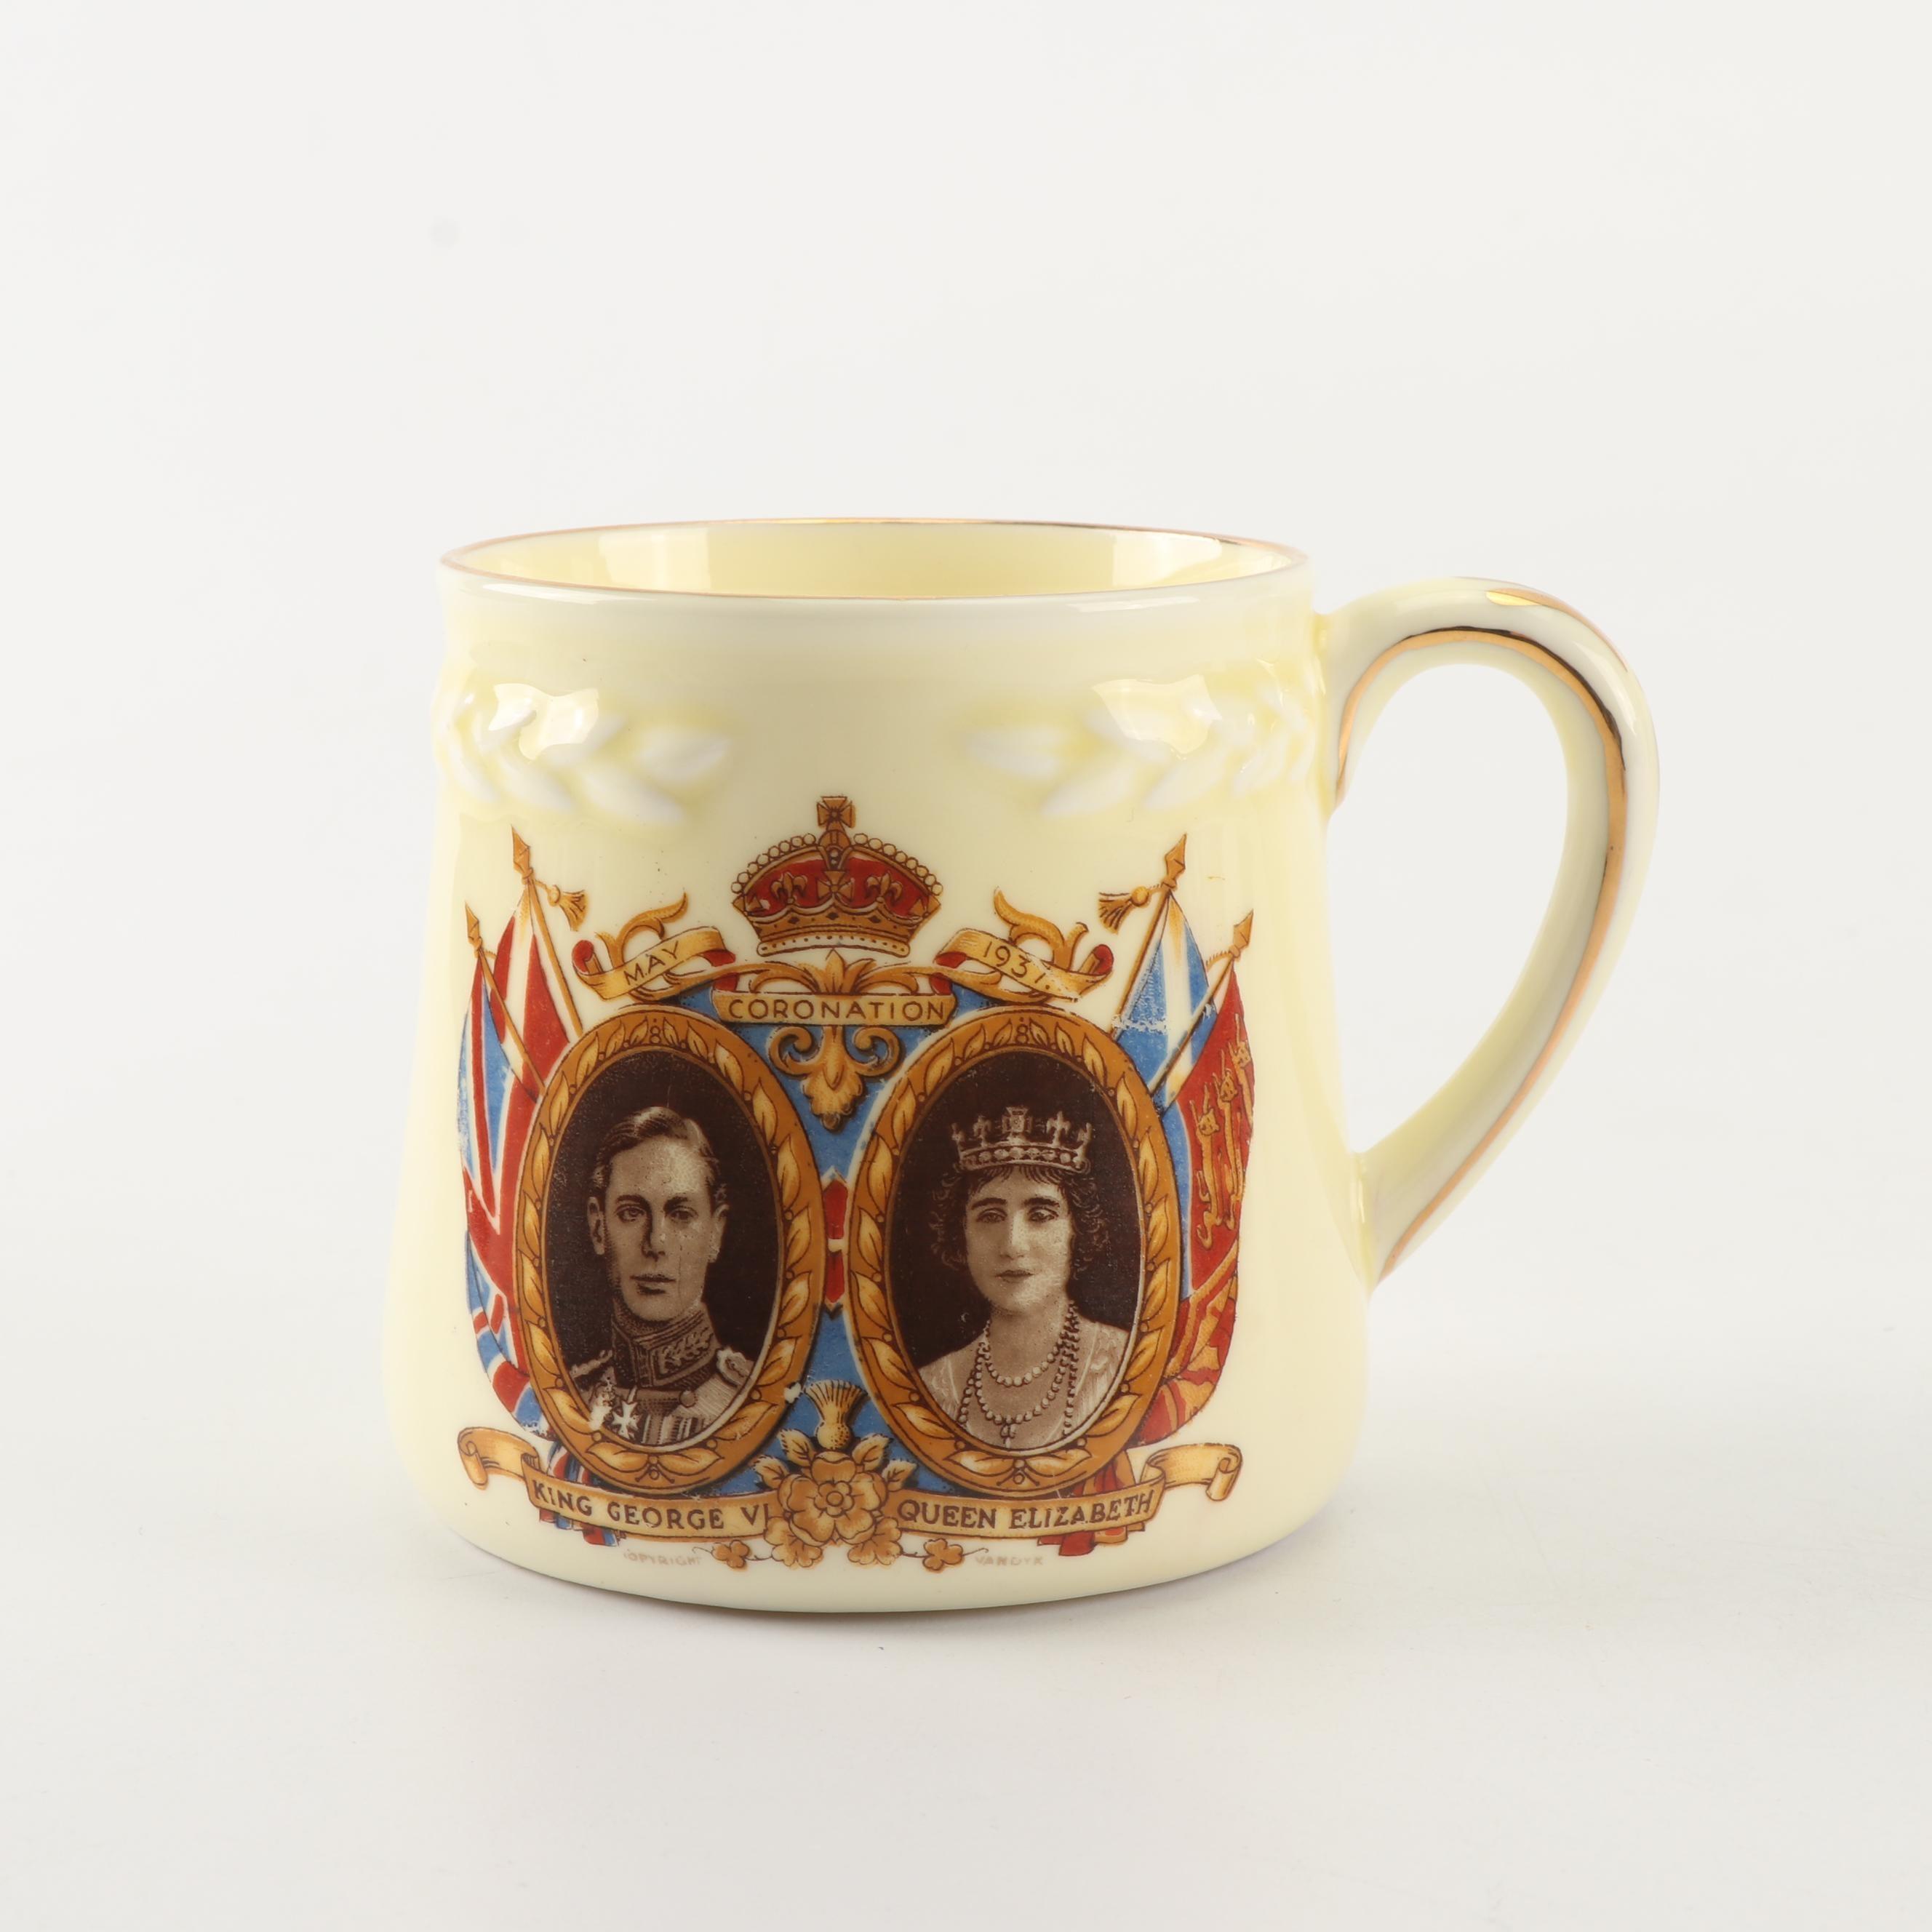 King George VI and Queen Elizabeth Coronation Commemorative Mug, 1937